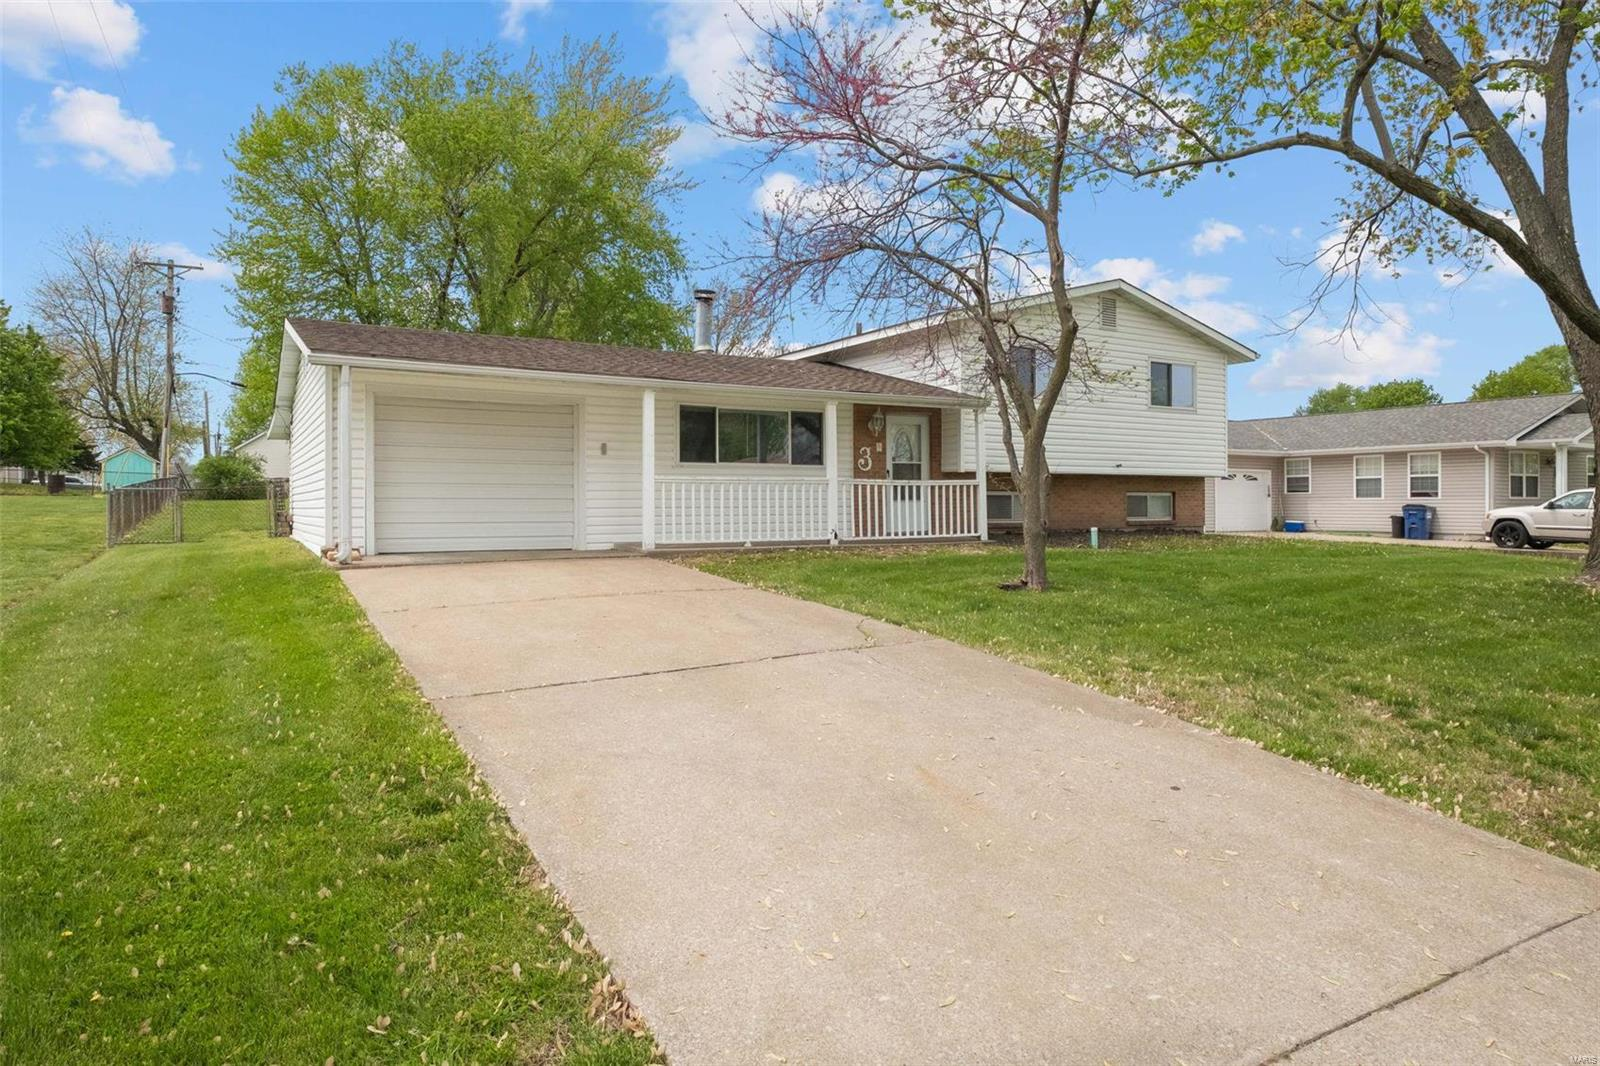 21025449 Property Photo